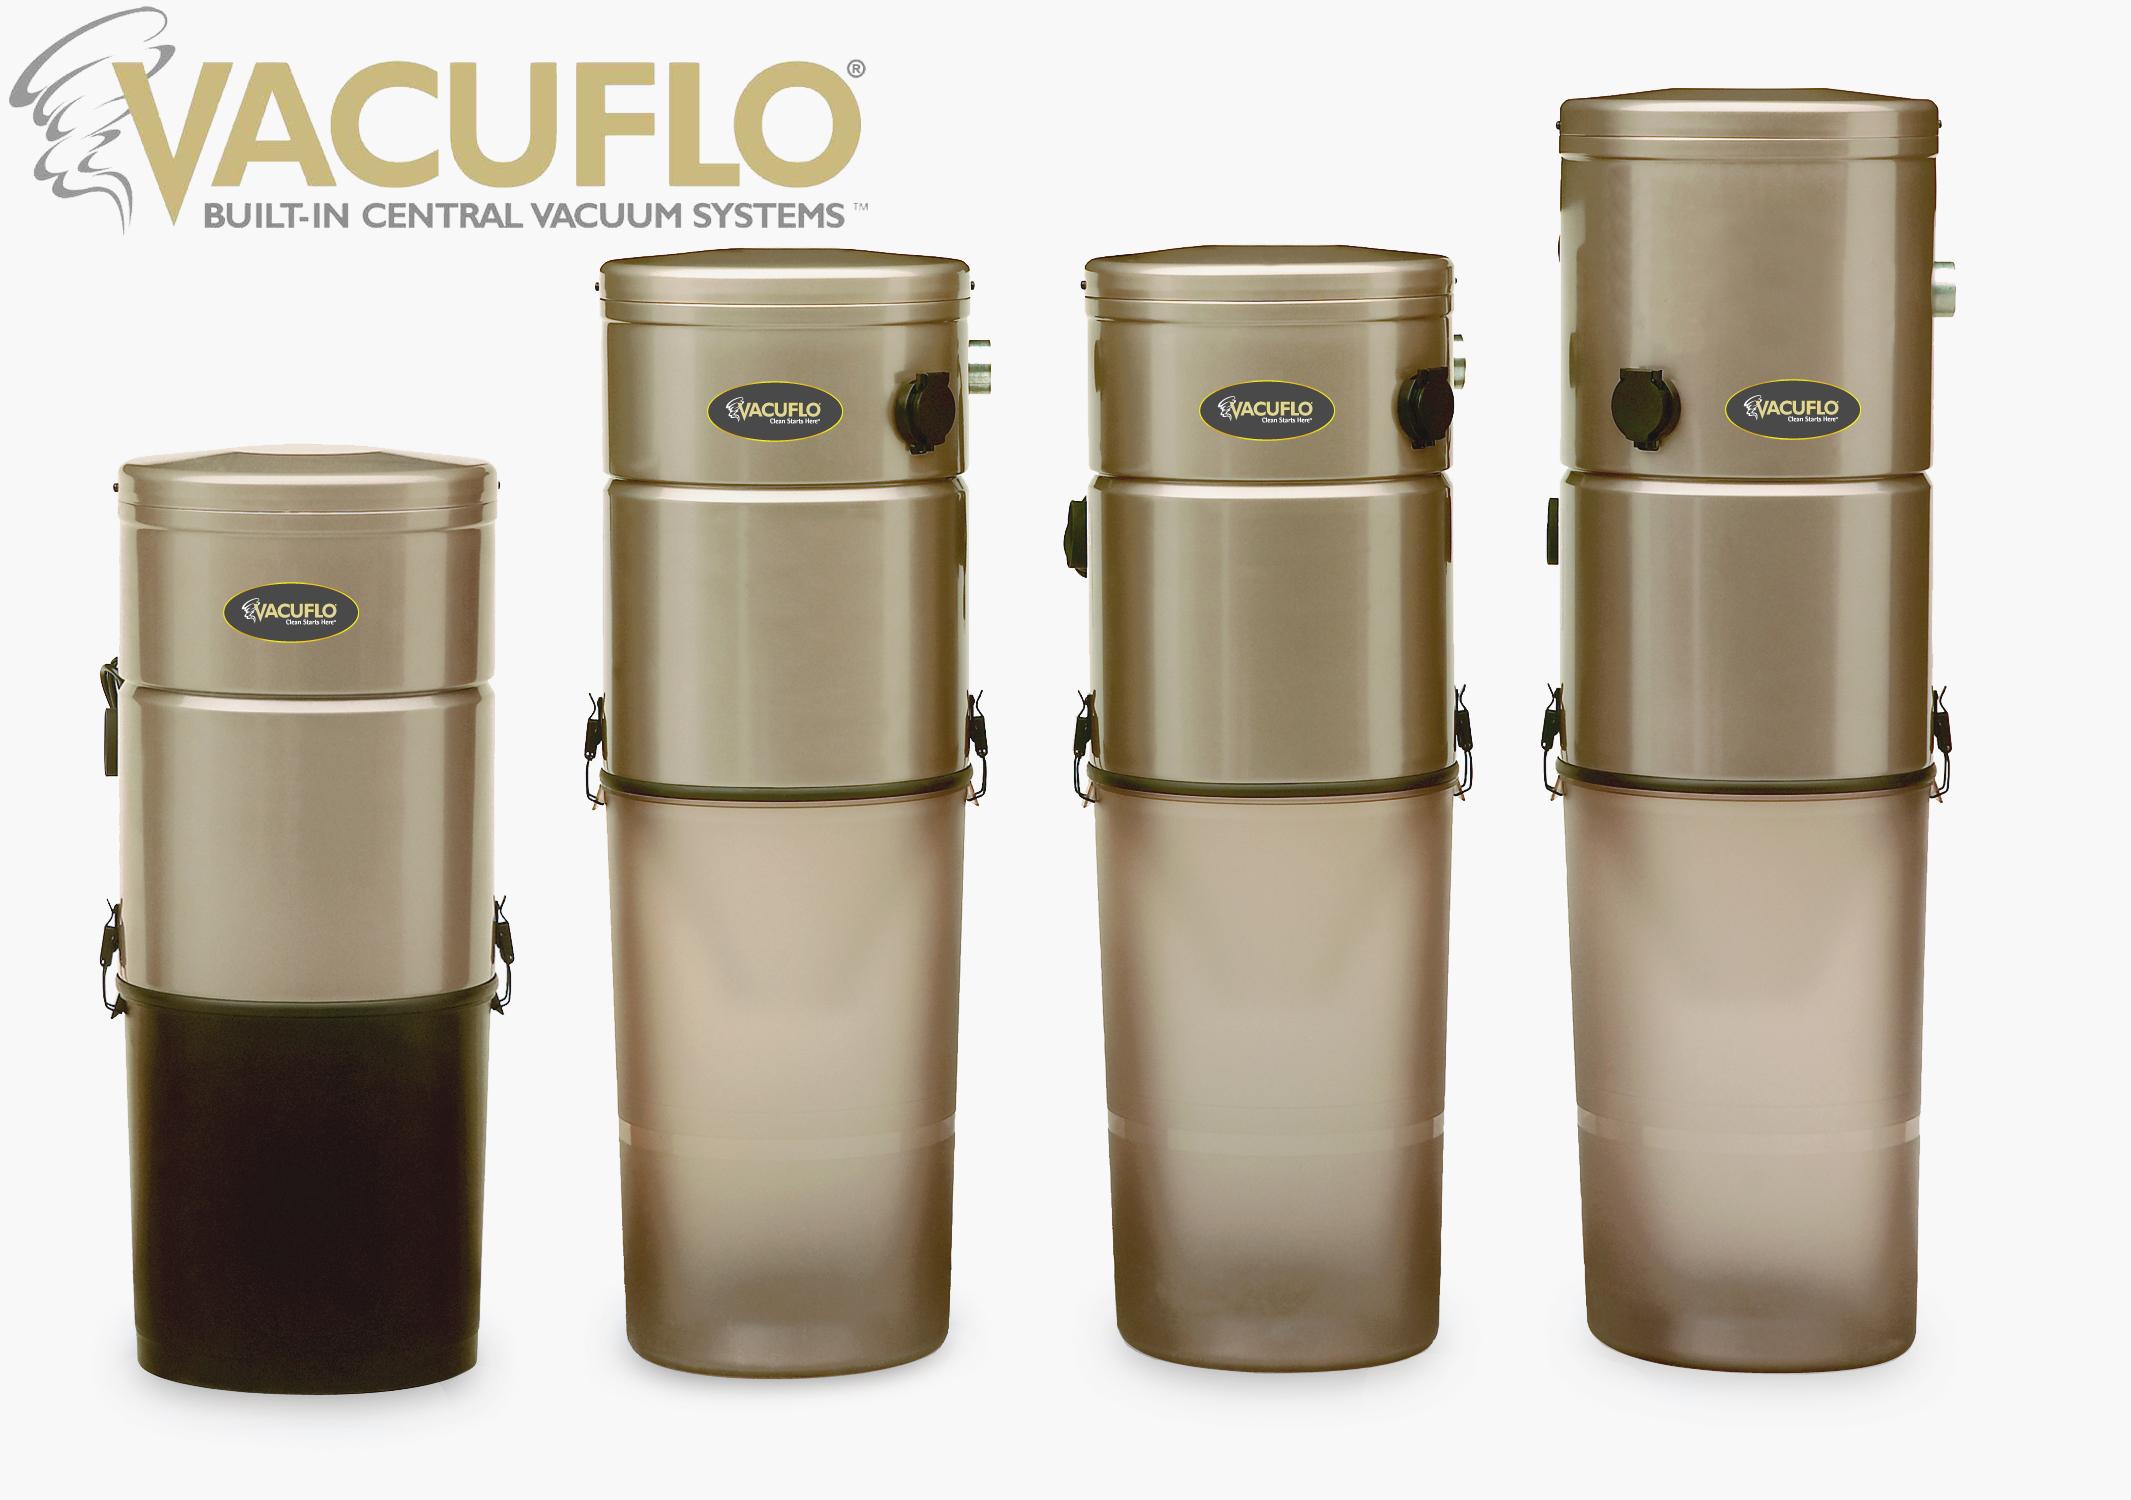 vacuflo central vacuum systems vs upright vacuums rh customvacs com